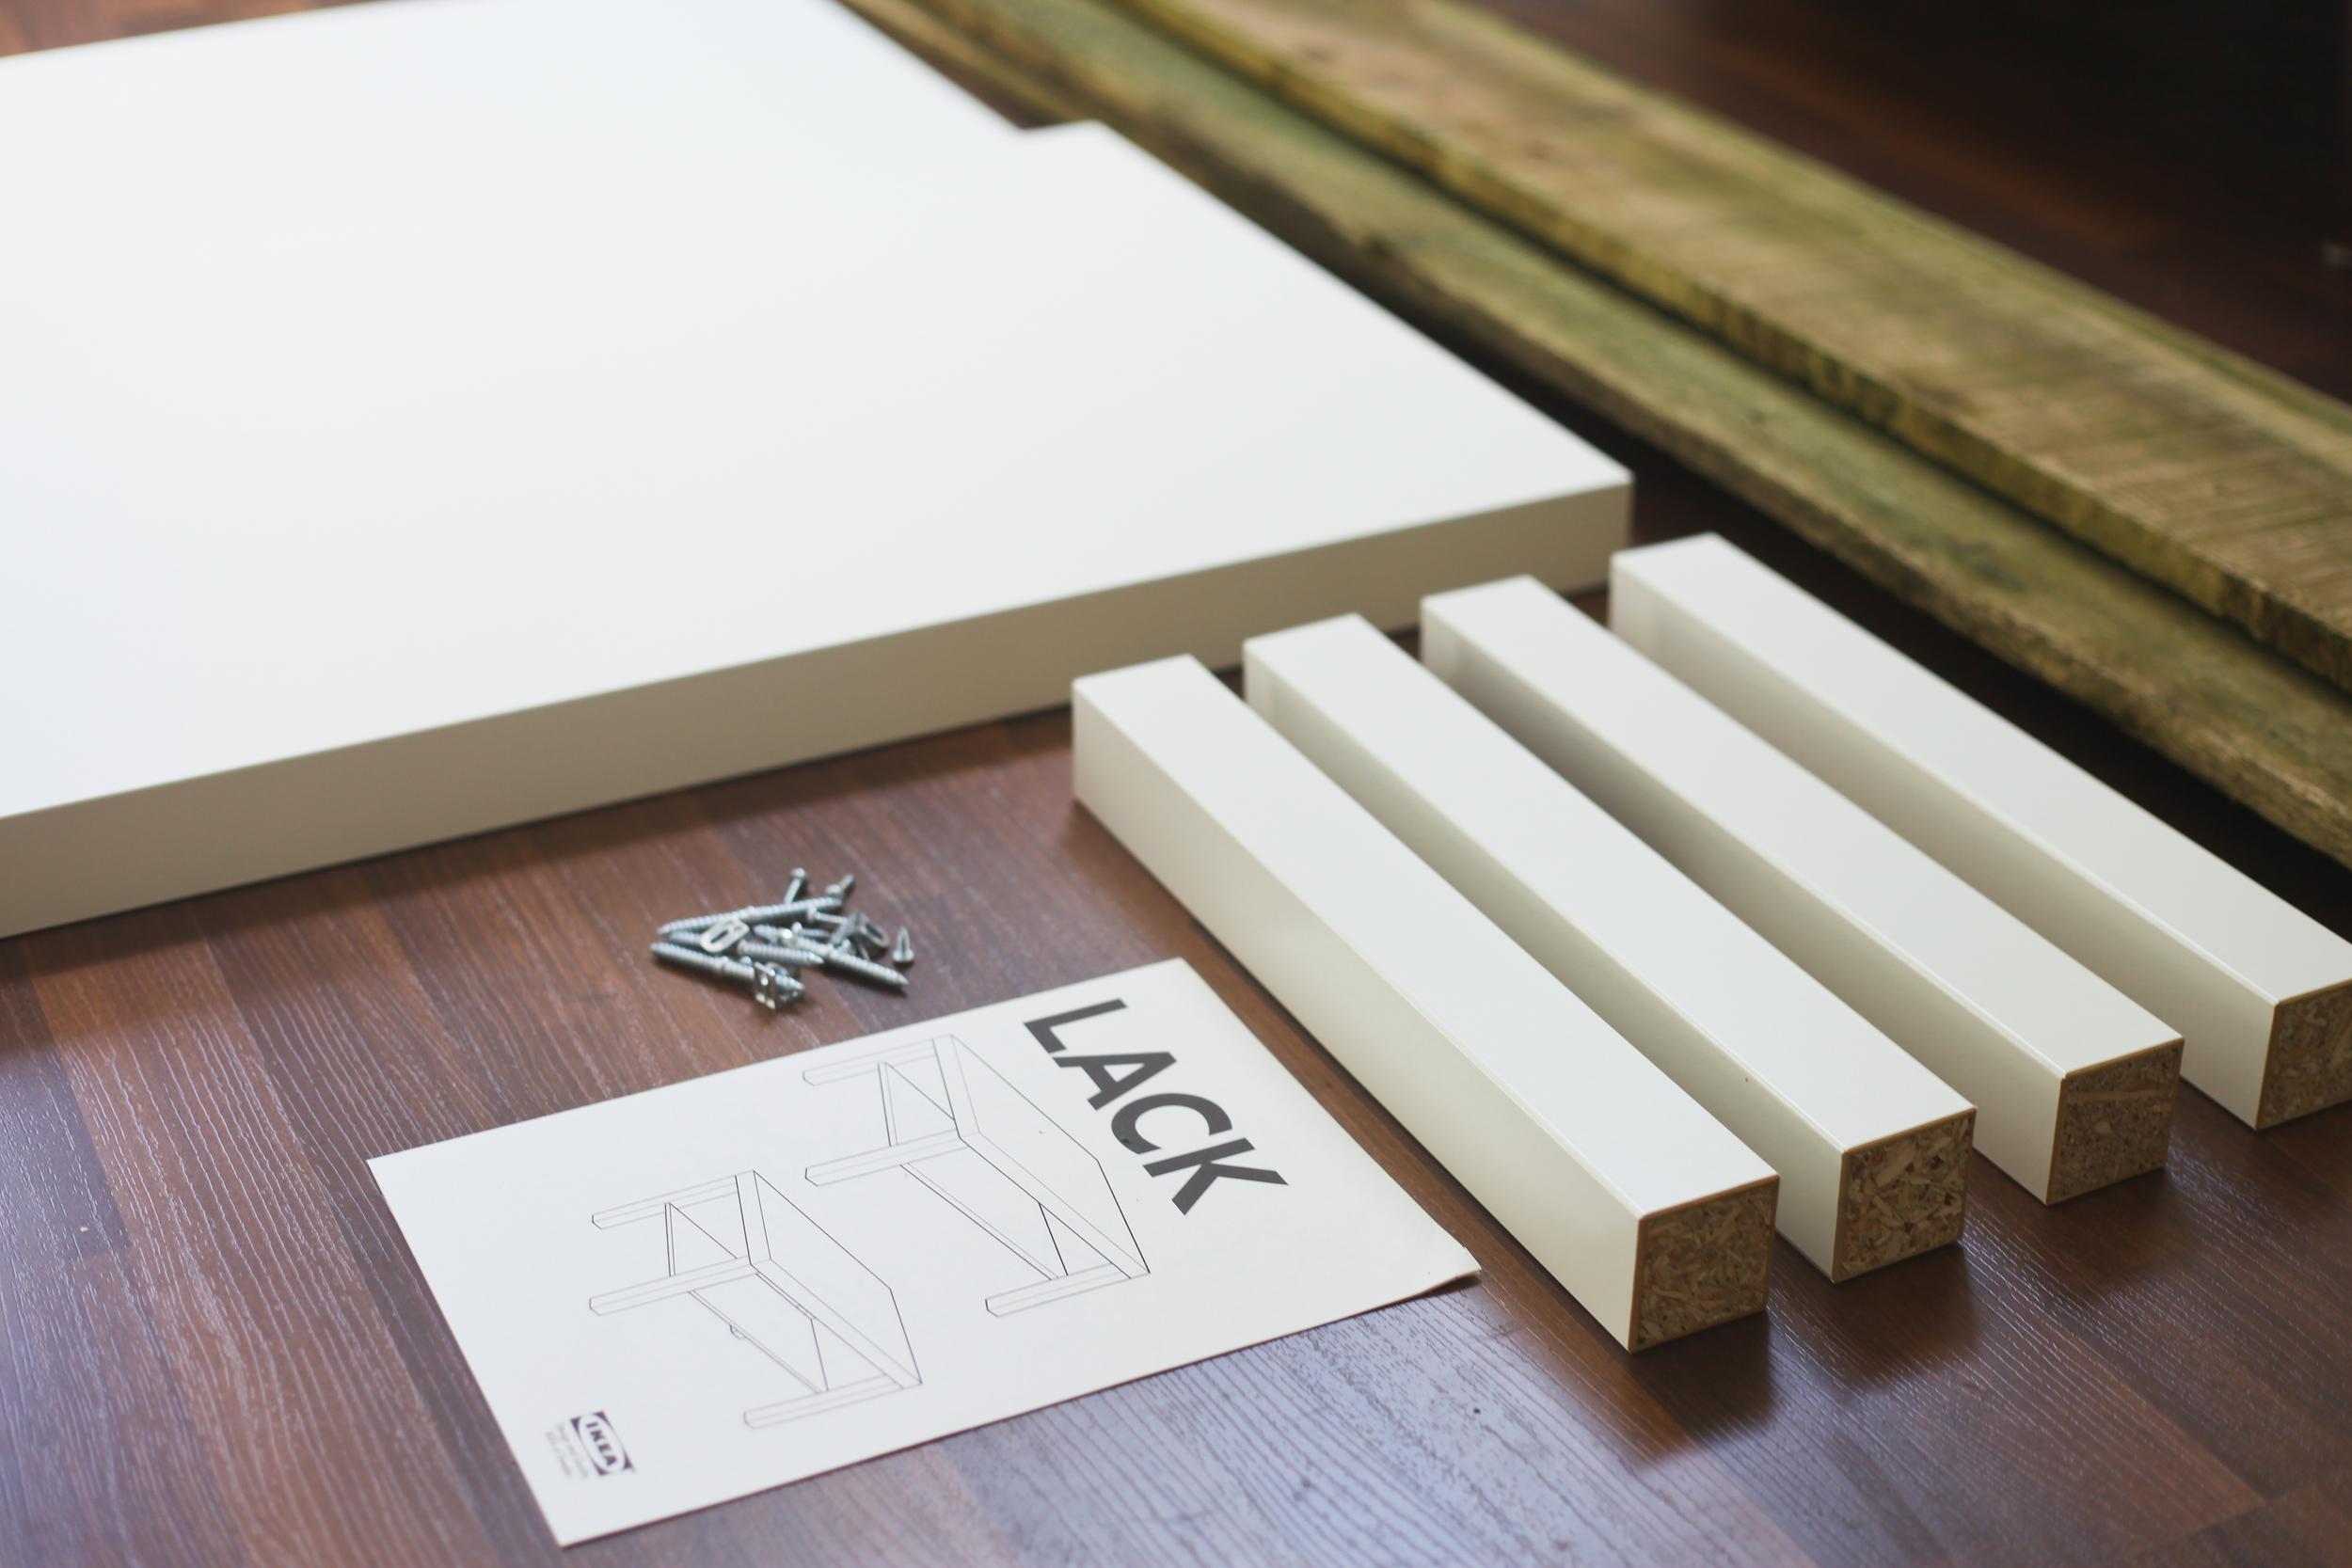 Ikea Hacks 3 Easy Steps To Create Your Own Ikea Coffee